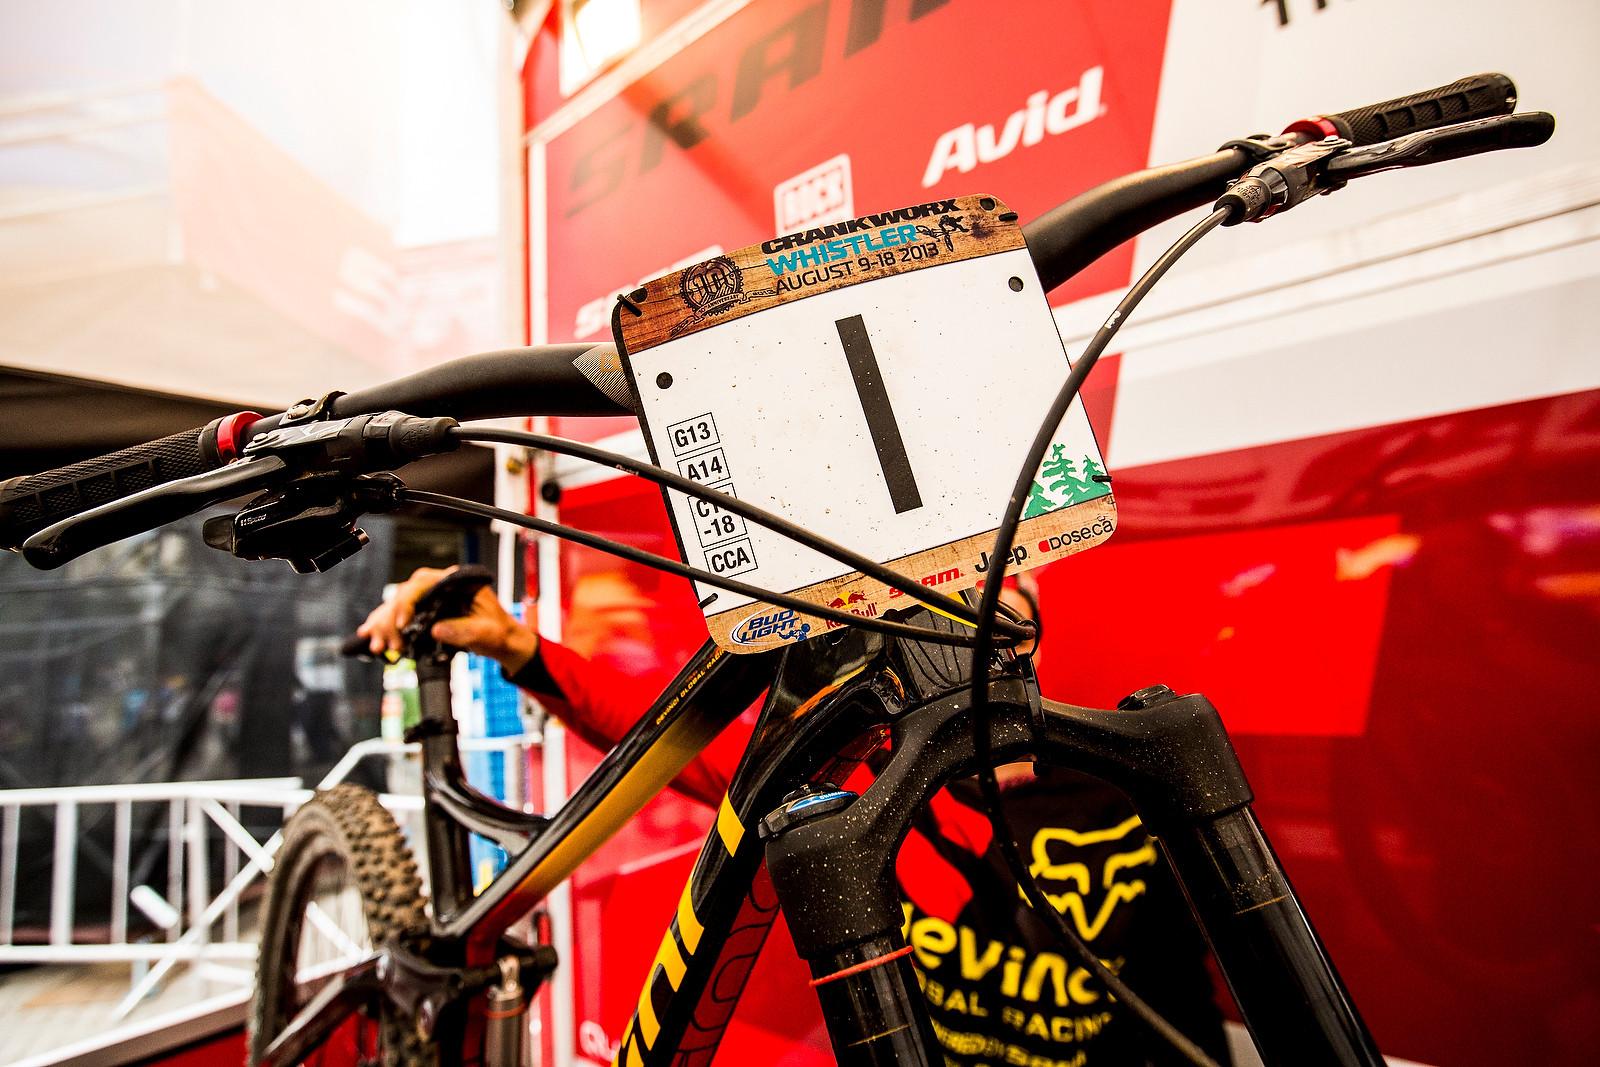 WINNING BIKE: Steve Smith's All-New 650B Devinci Troy - Winning Bike: Steve Smith's All-New 650B Devinci Troy - Mountain Biking Pictures - Vital MTB